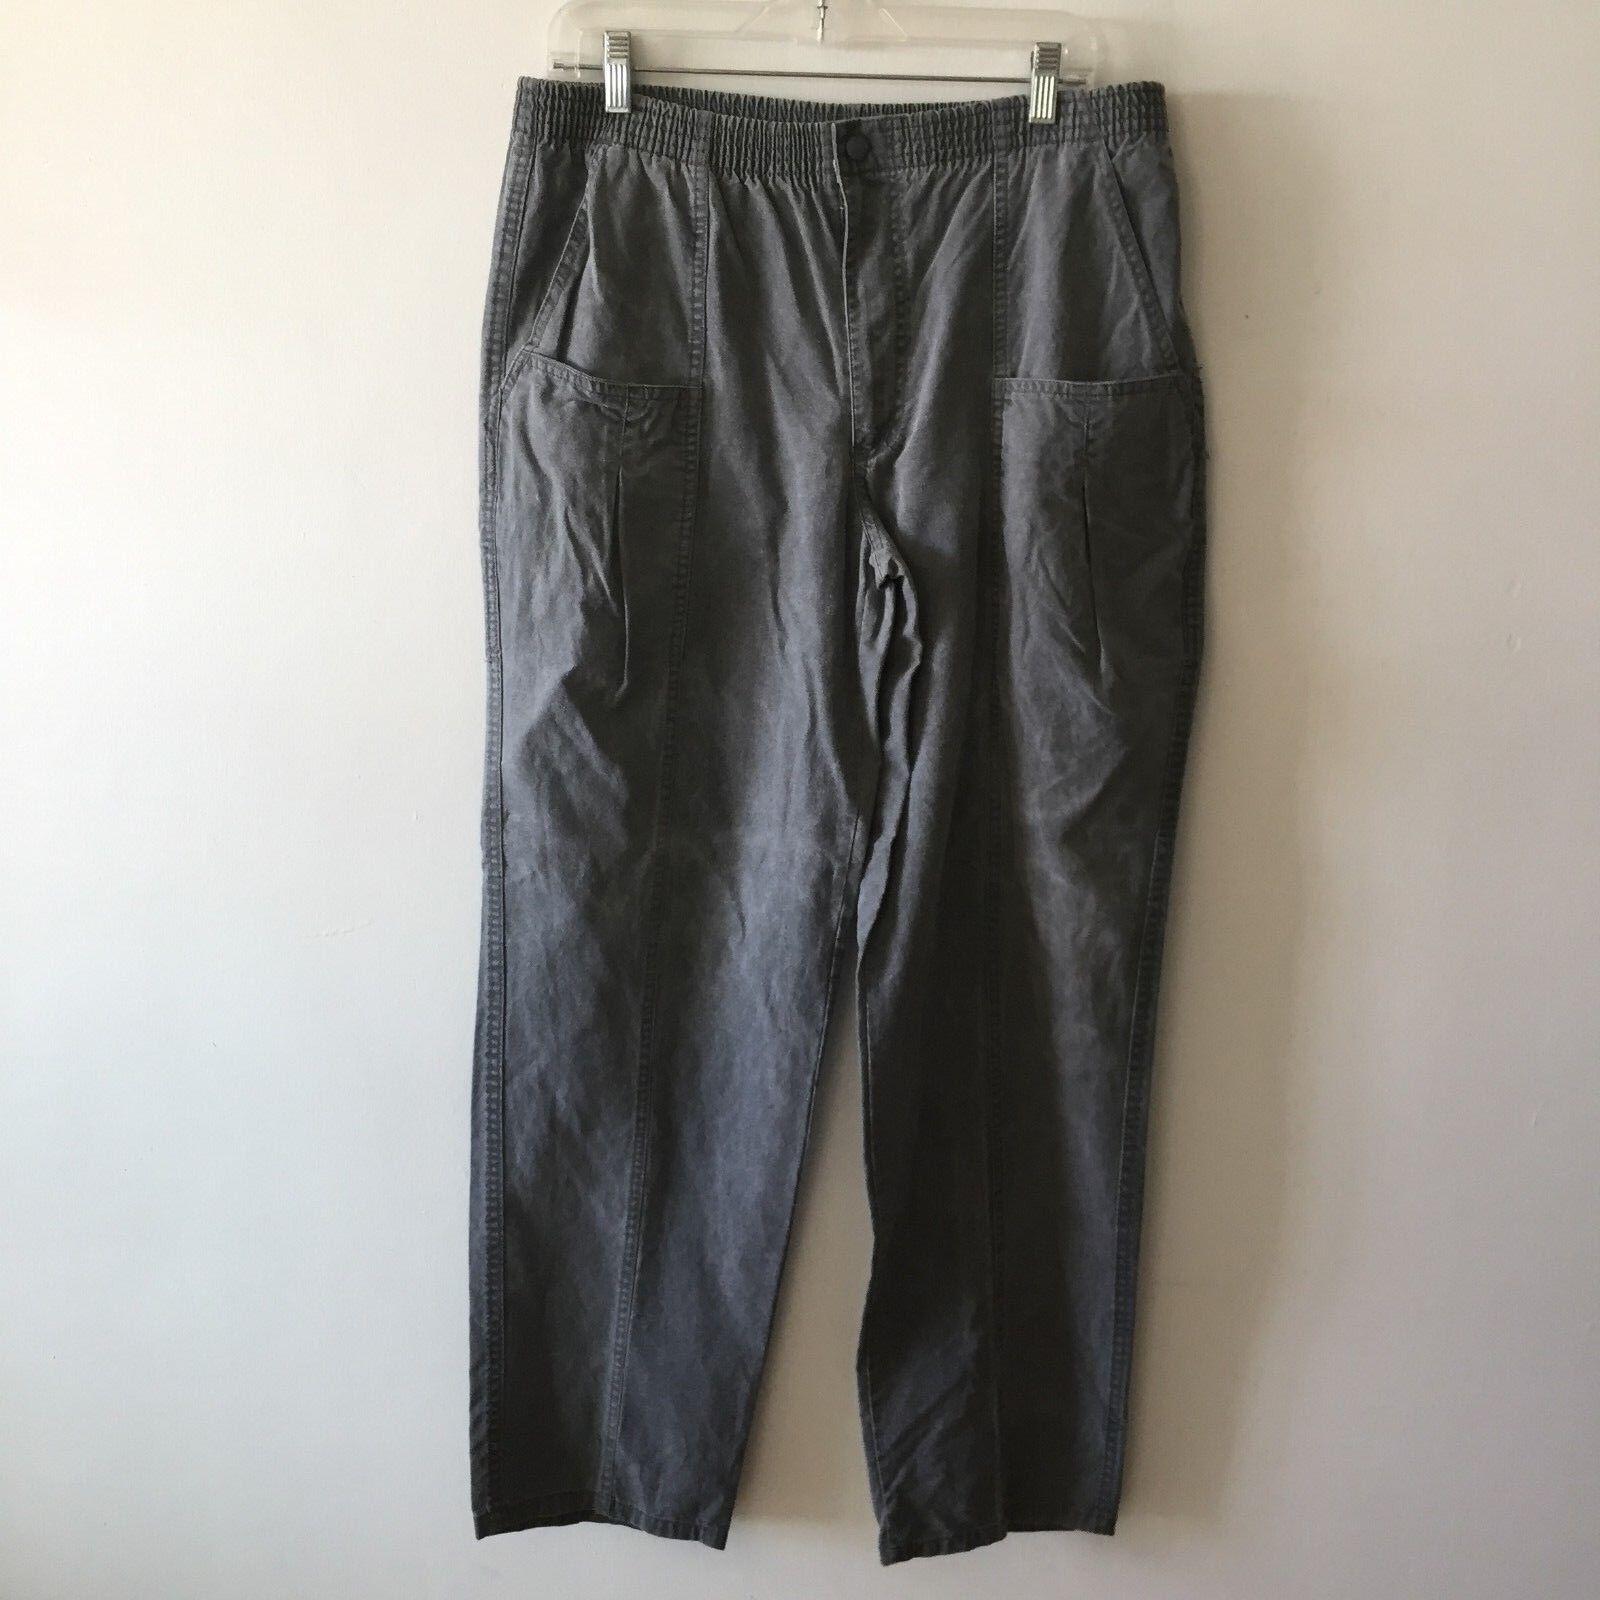 Ocean Pacific OP Vintage Lounge Pants Jams Cargo Elastic Stretch Men's 34